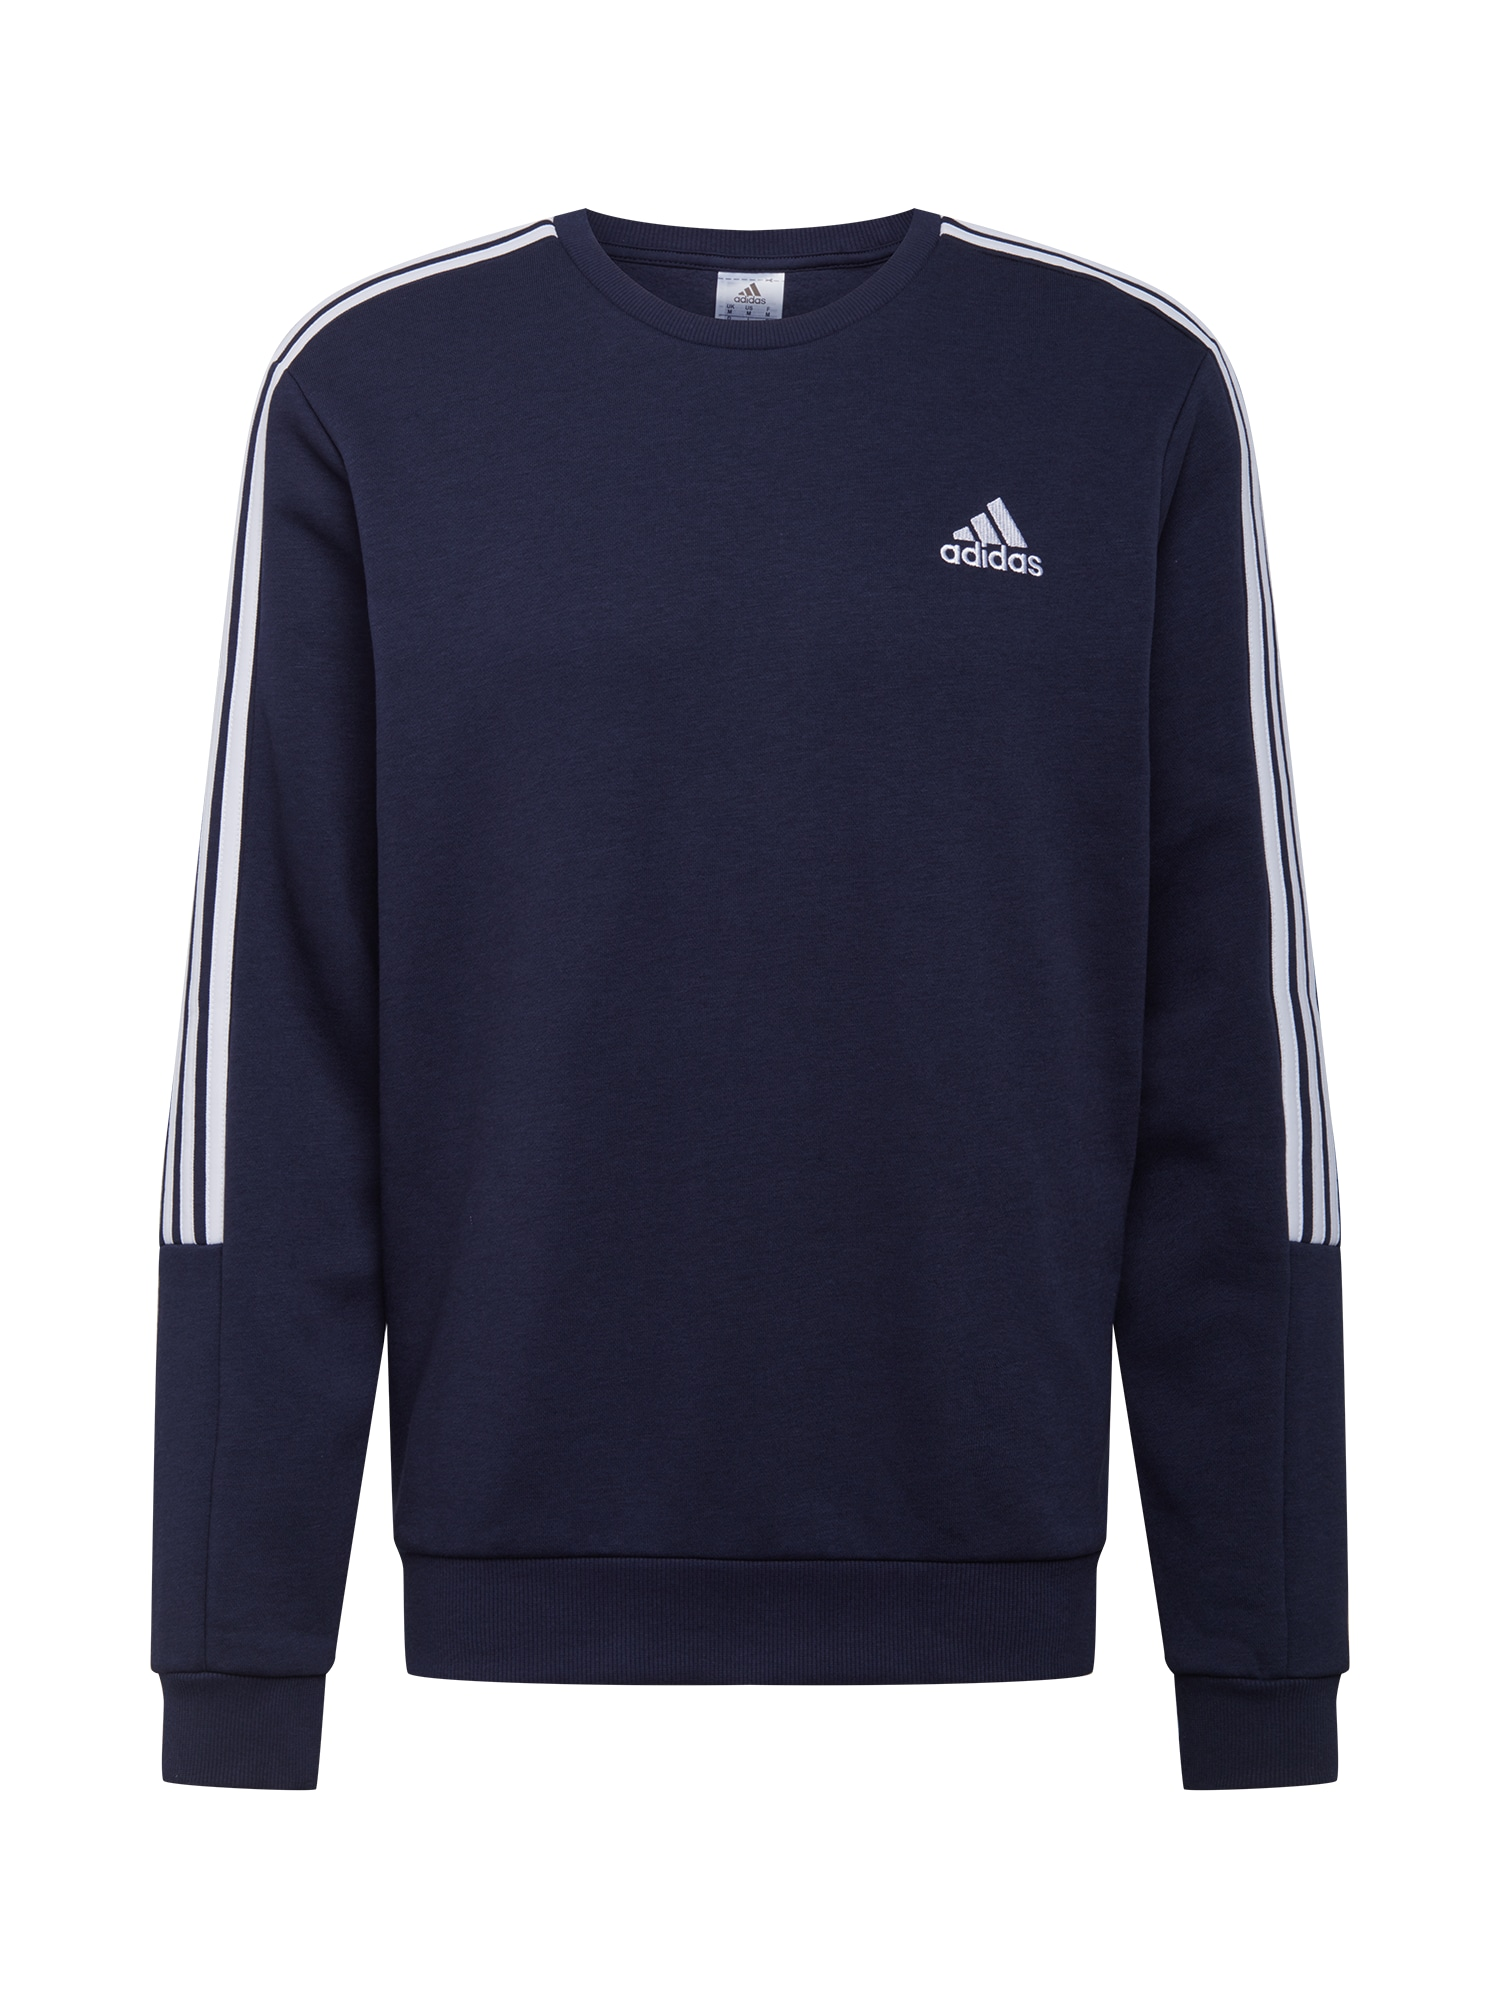 ADIDAS PERFORMANCE Sportinio tipo megztinis mėlyna / balta